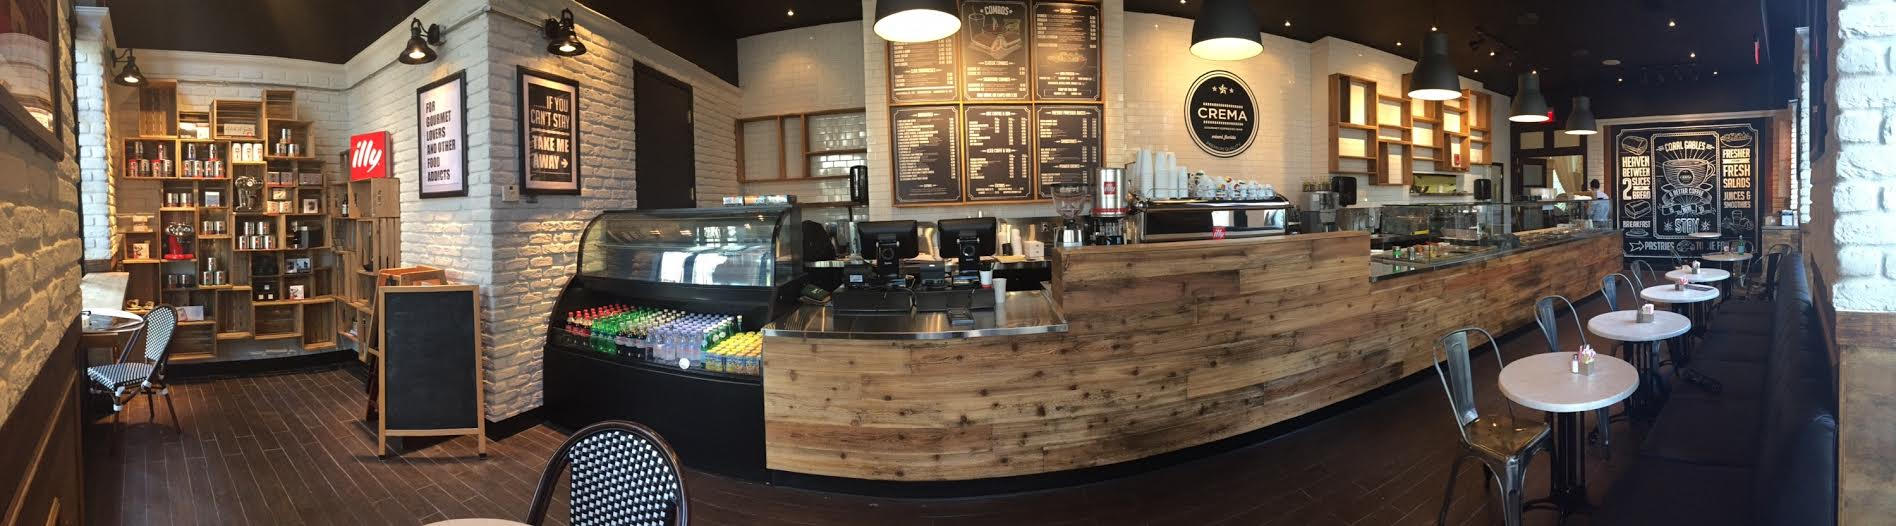 Crema Gourmet Espresso Bar Opens in Coral Gables